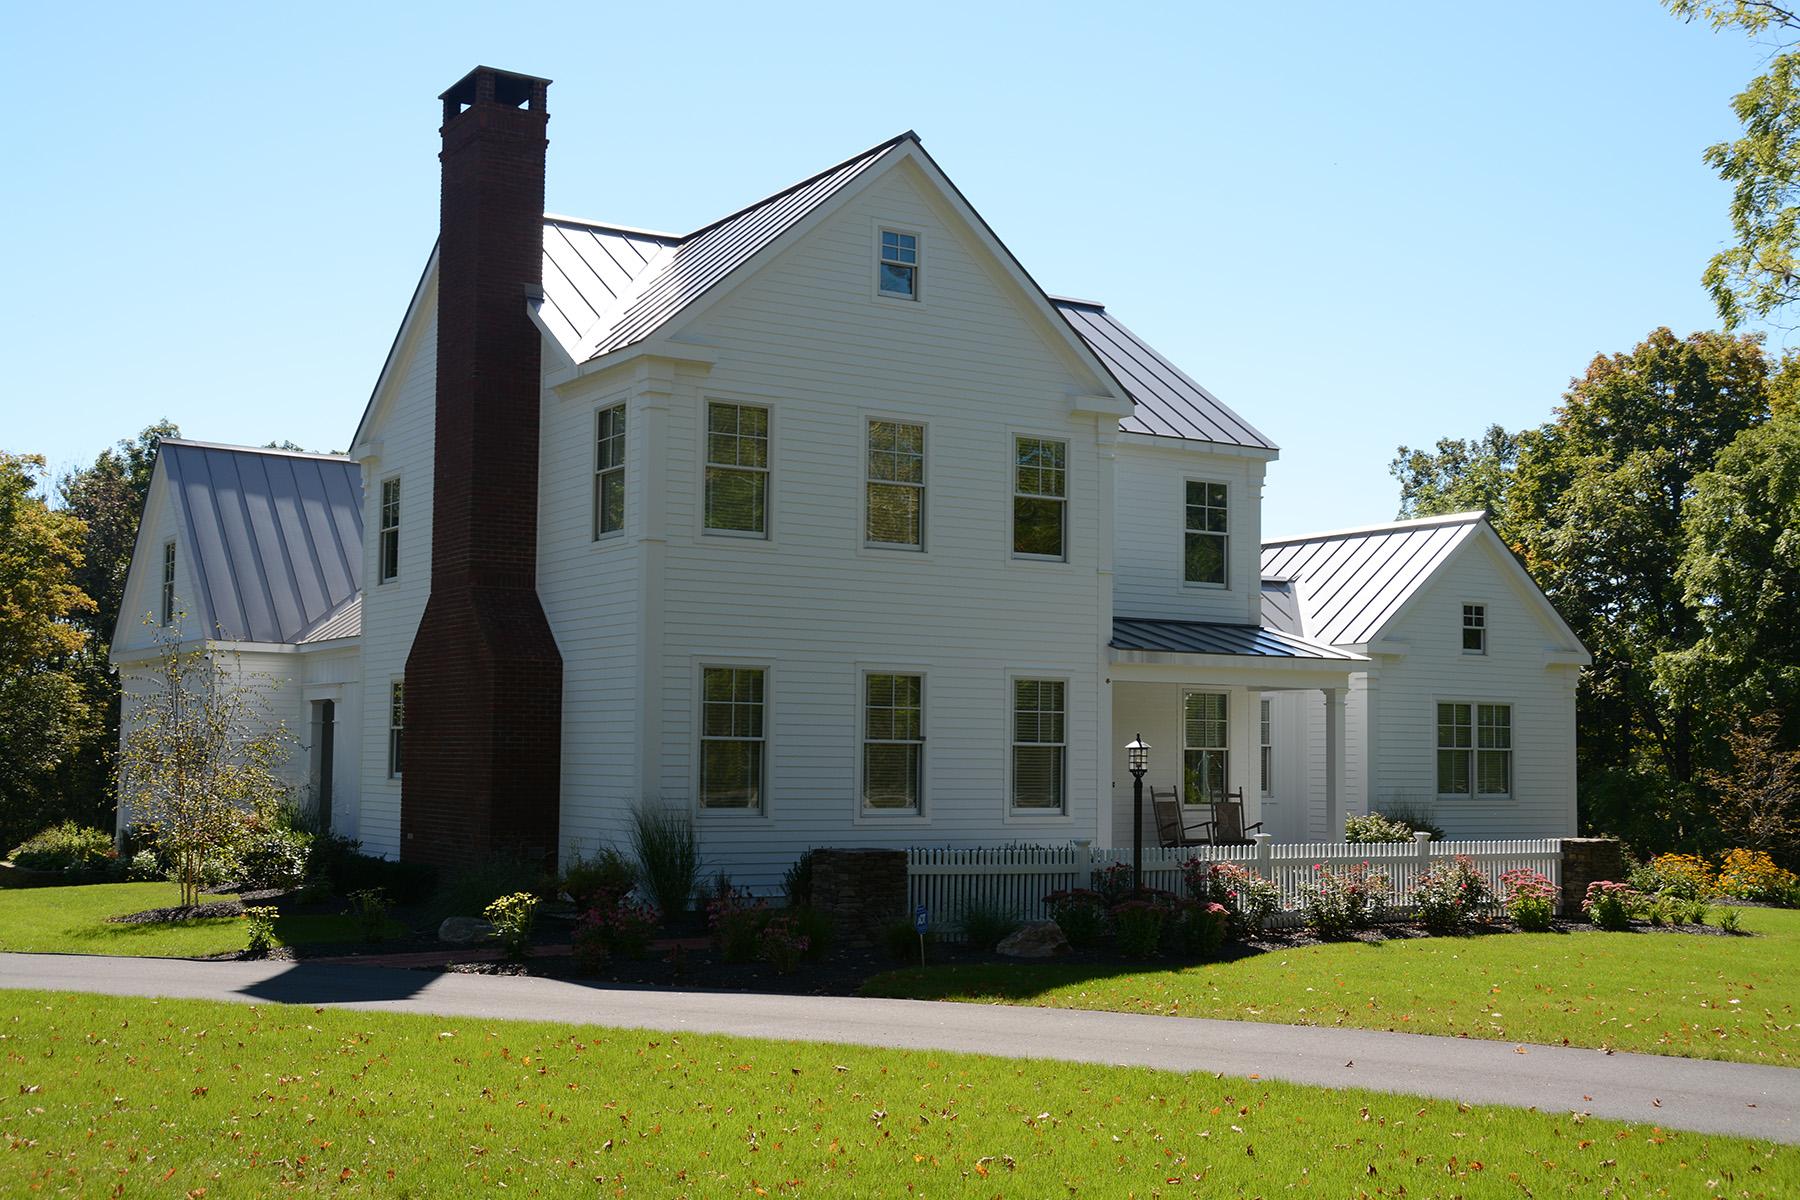 Additional photo for property listing at Award-Winning Iconic Saratoga Farmhouse 48  Nelson Av Ext Saratoga Springs, New York 12866 États-Unis